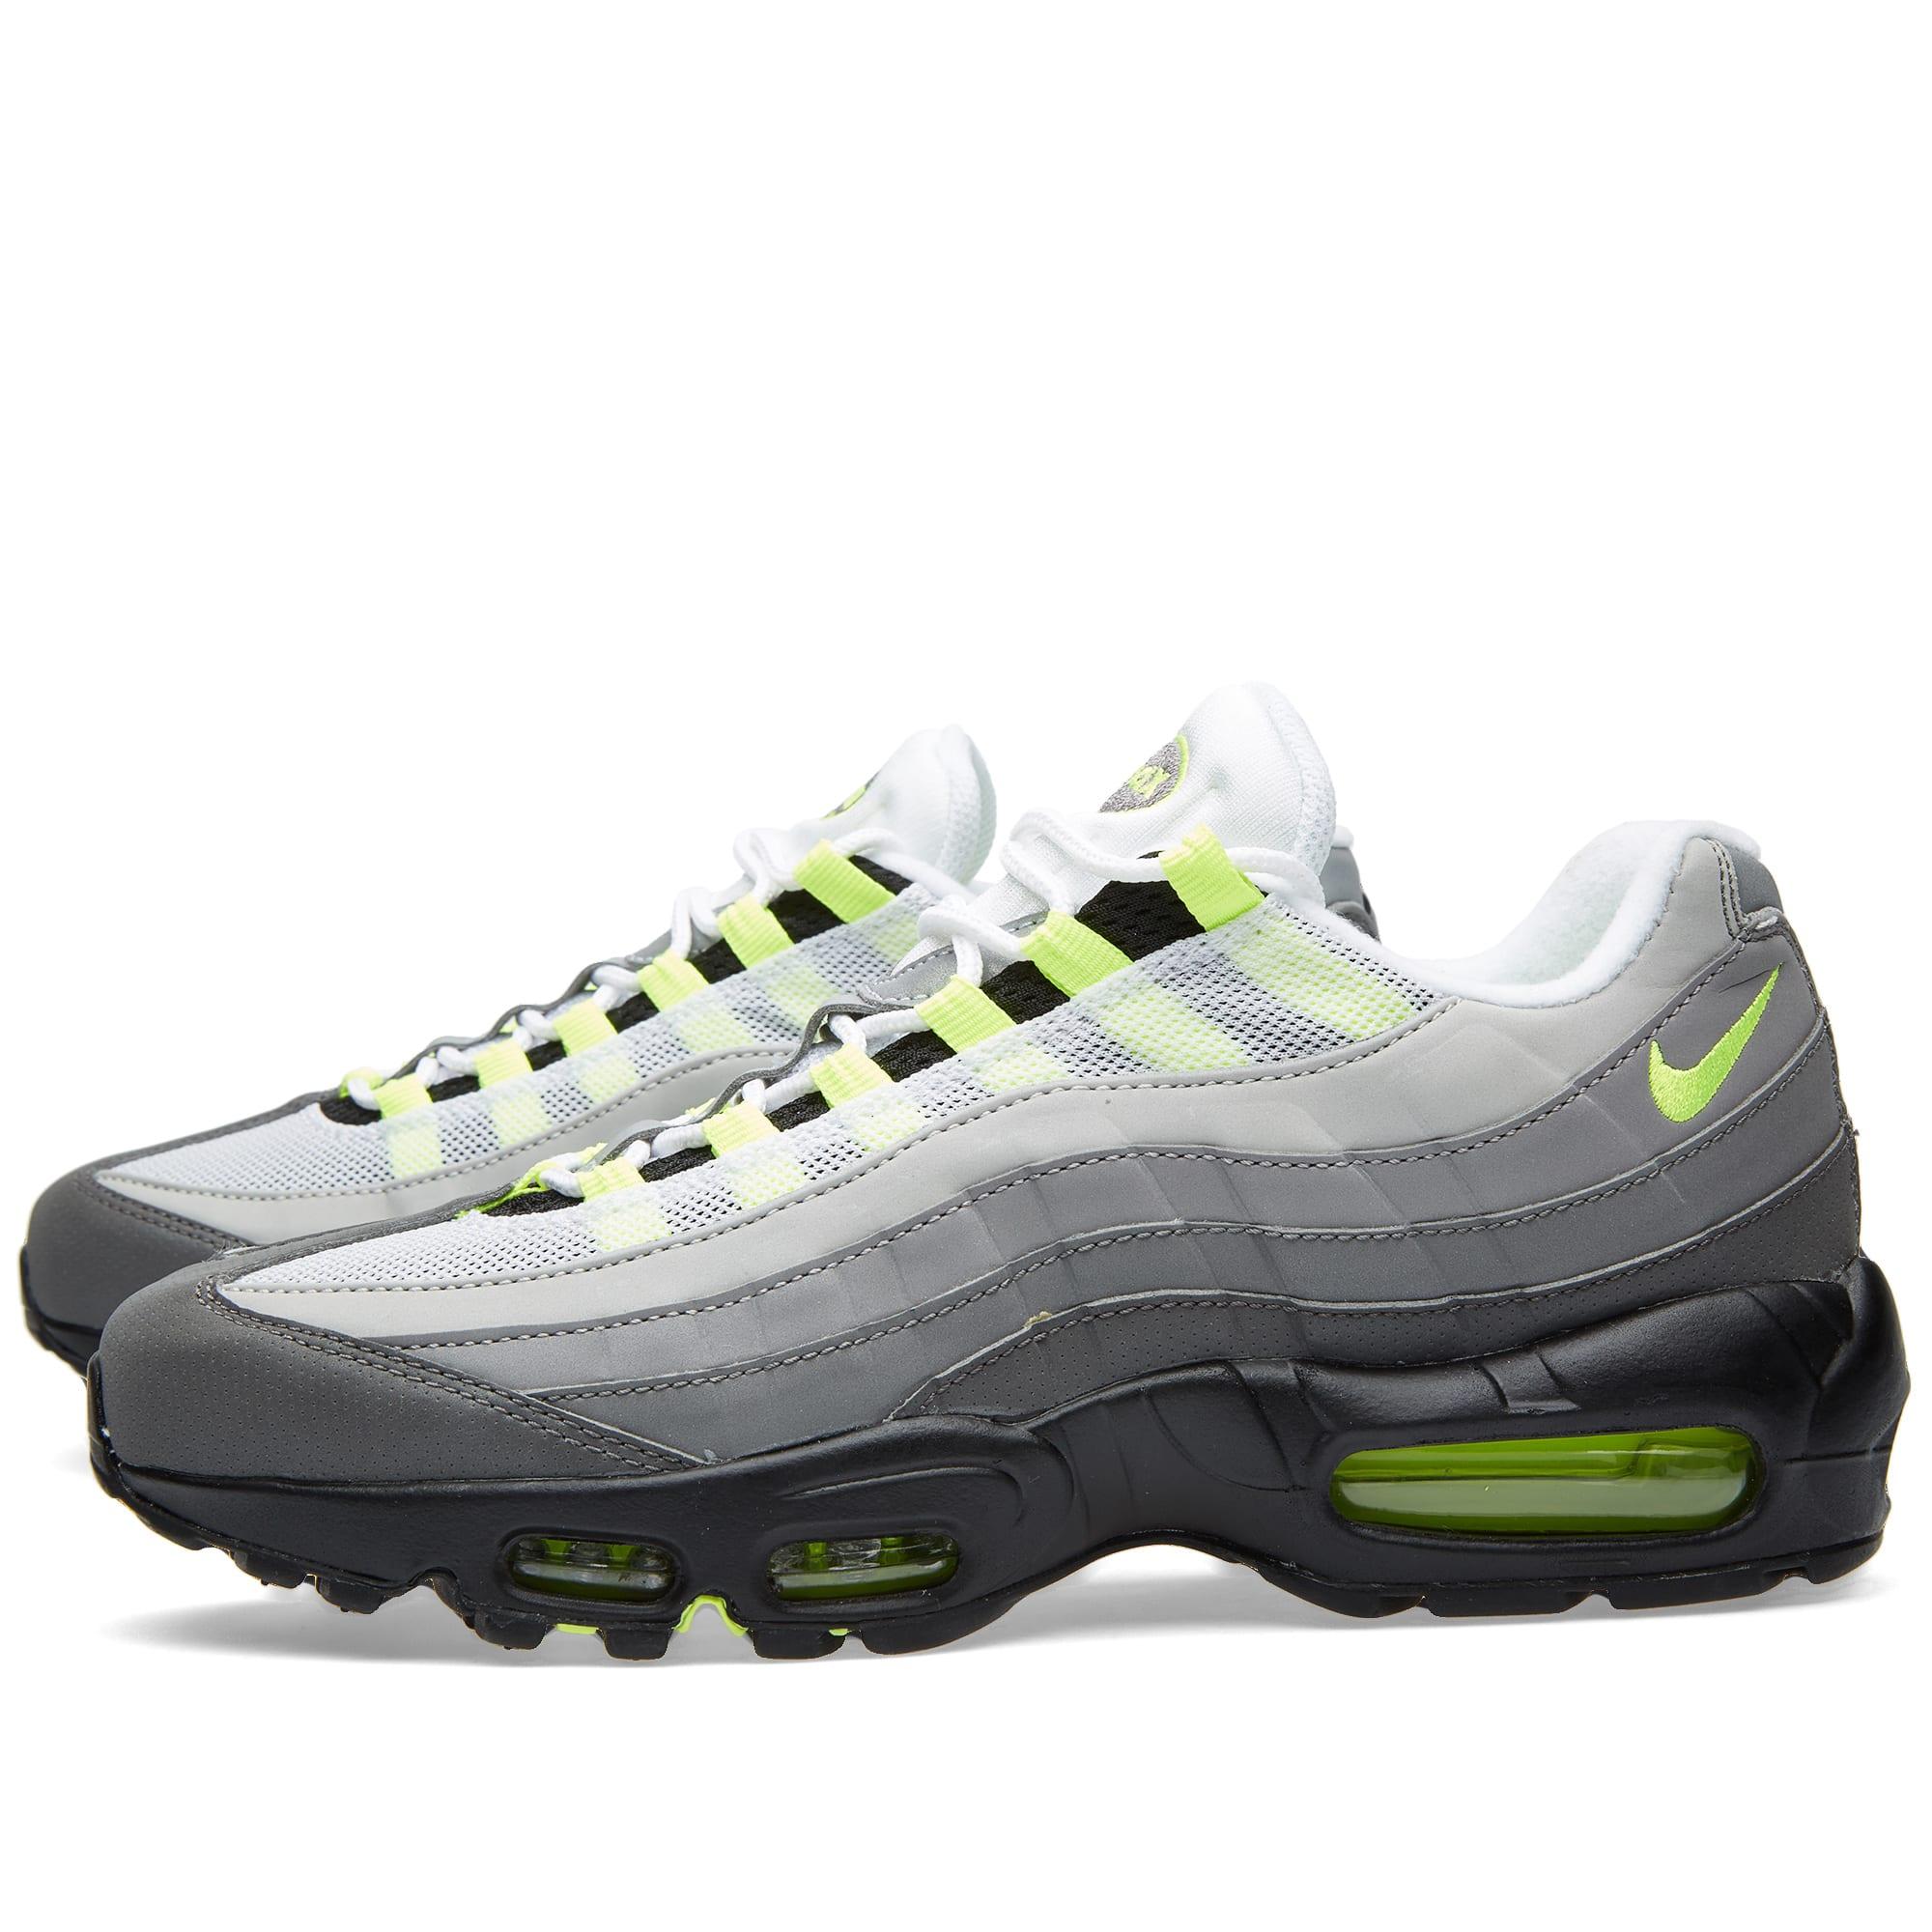 san francisco a1be1 d3113 Nike Air Max 95 OG Premium Leather  Reflective . Black, Volt ...